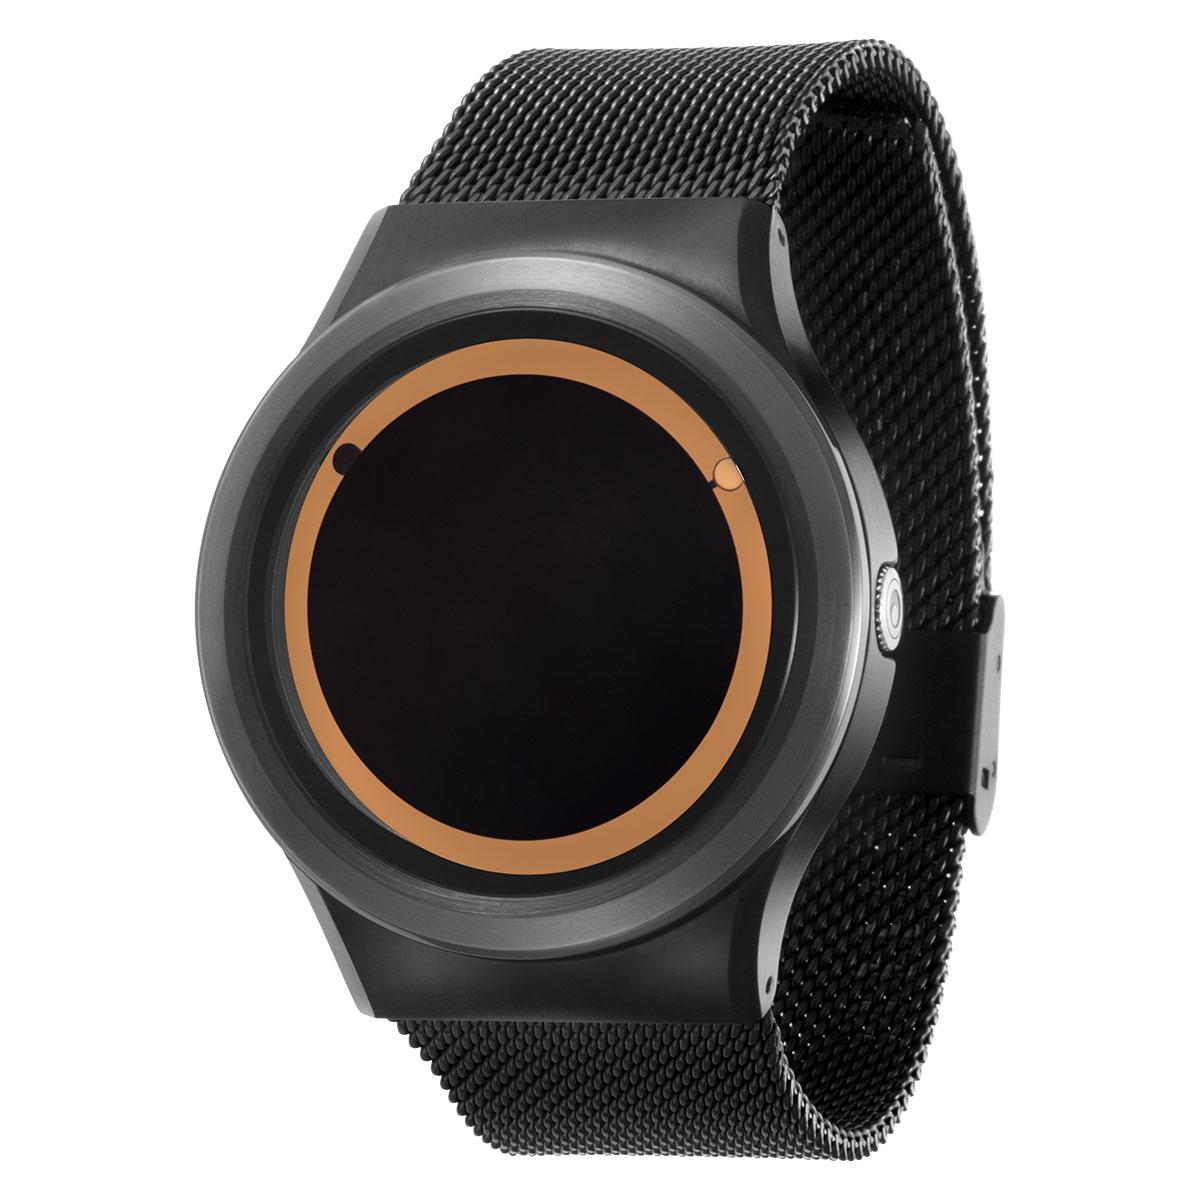 ZEROO PLANET ECLIPSE ゼロ 電池式クォーツ 腕時計 [W13029B03SM03] ベージュ デザインウォッチ ペア用 メンズ レディース ユニセックス おしゃれ時計 デザイナーズ